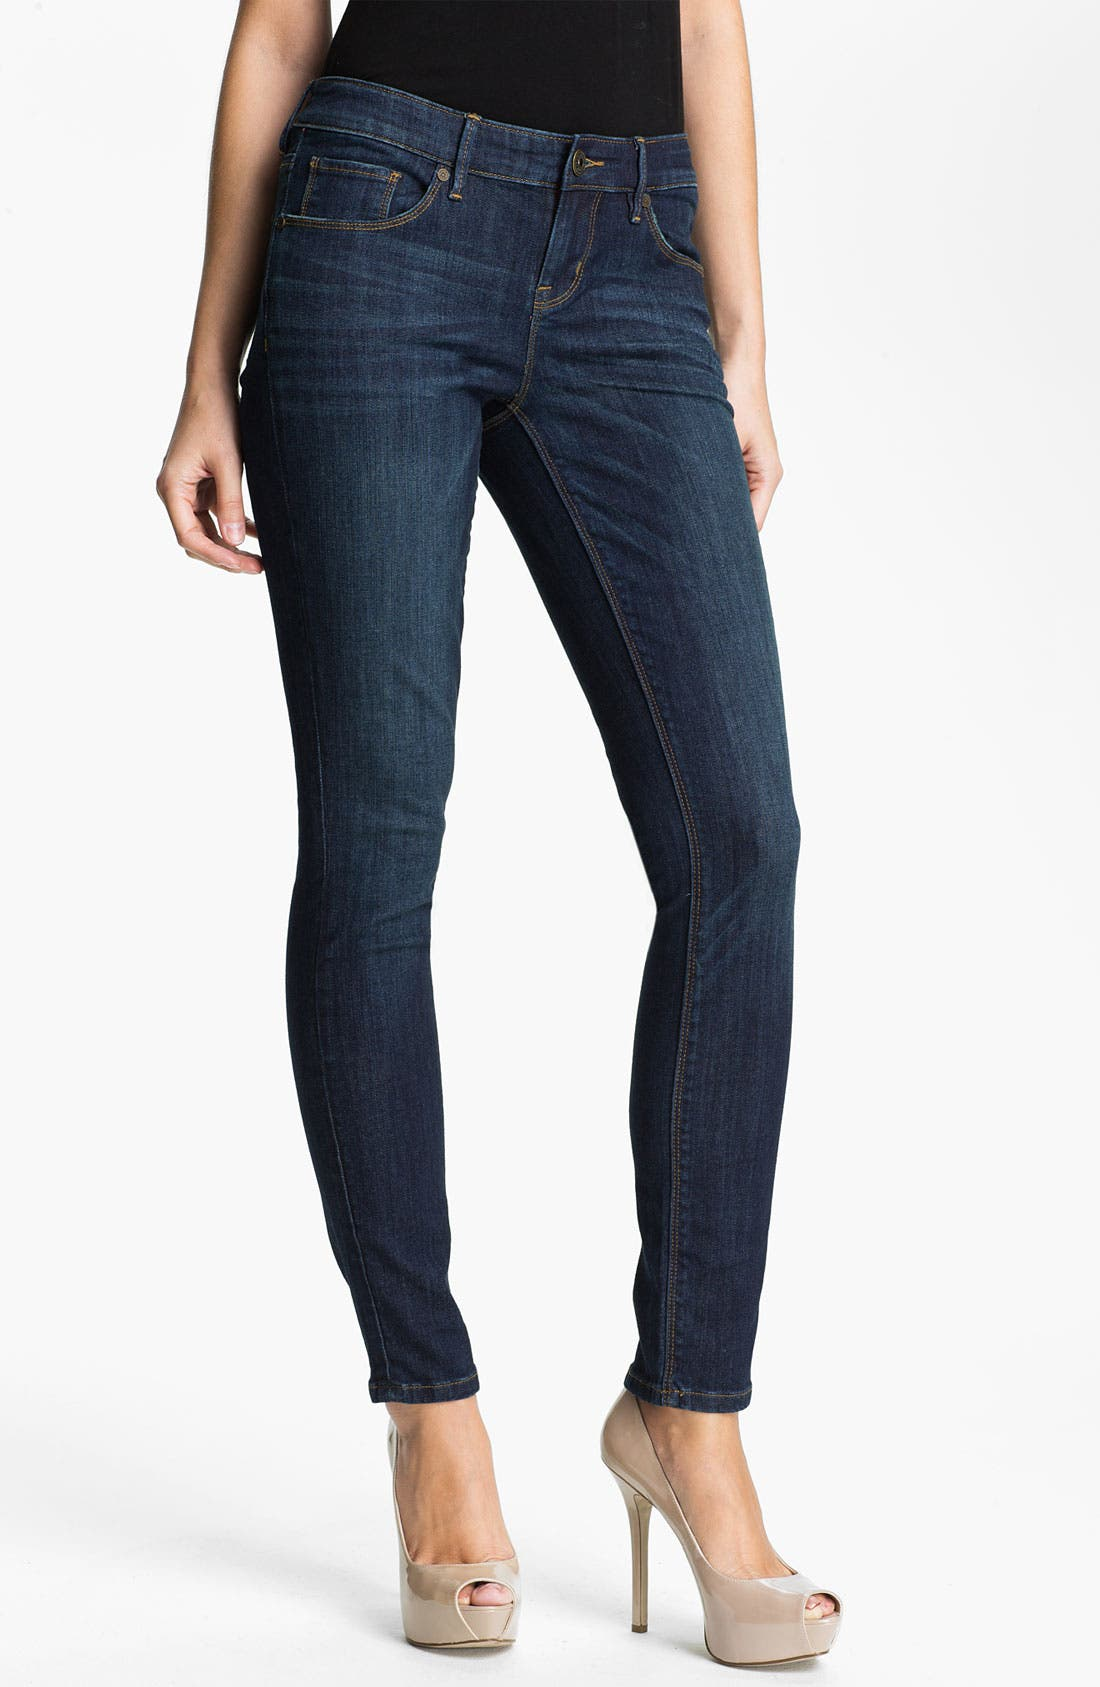 Alternate Image 1 Selected - Isaac Mizrahi Jeans 'Samantha' Skinny Jeans